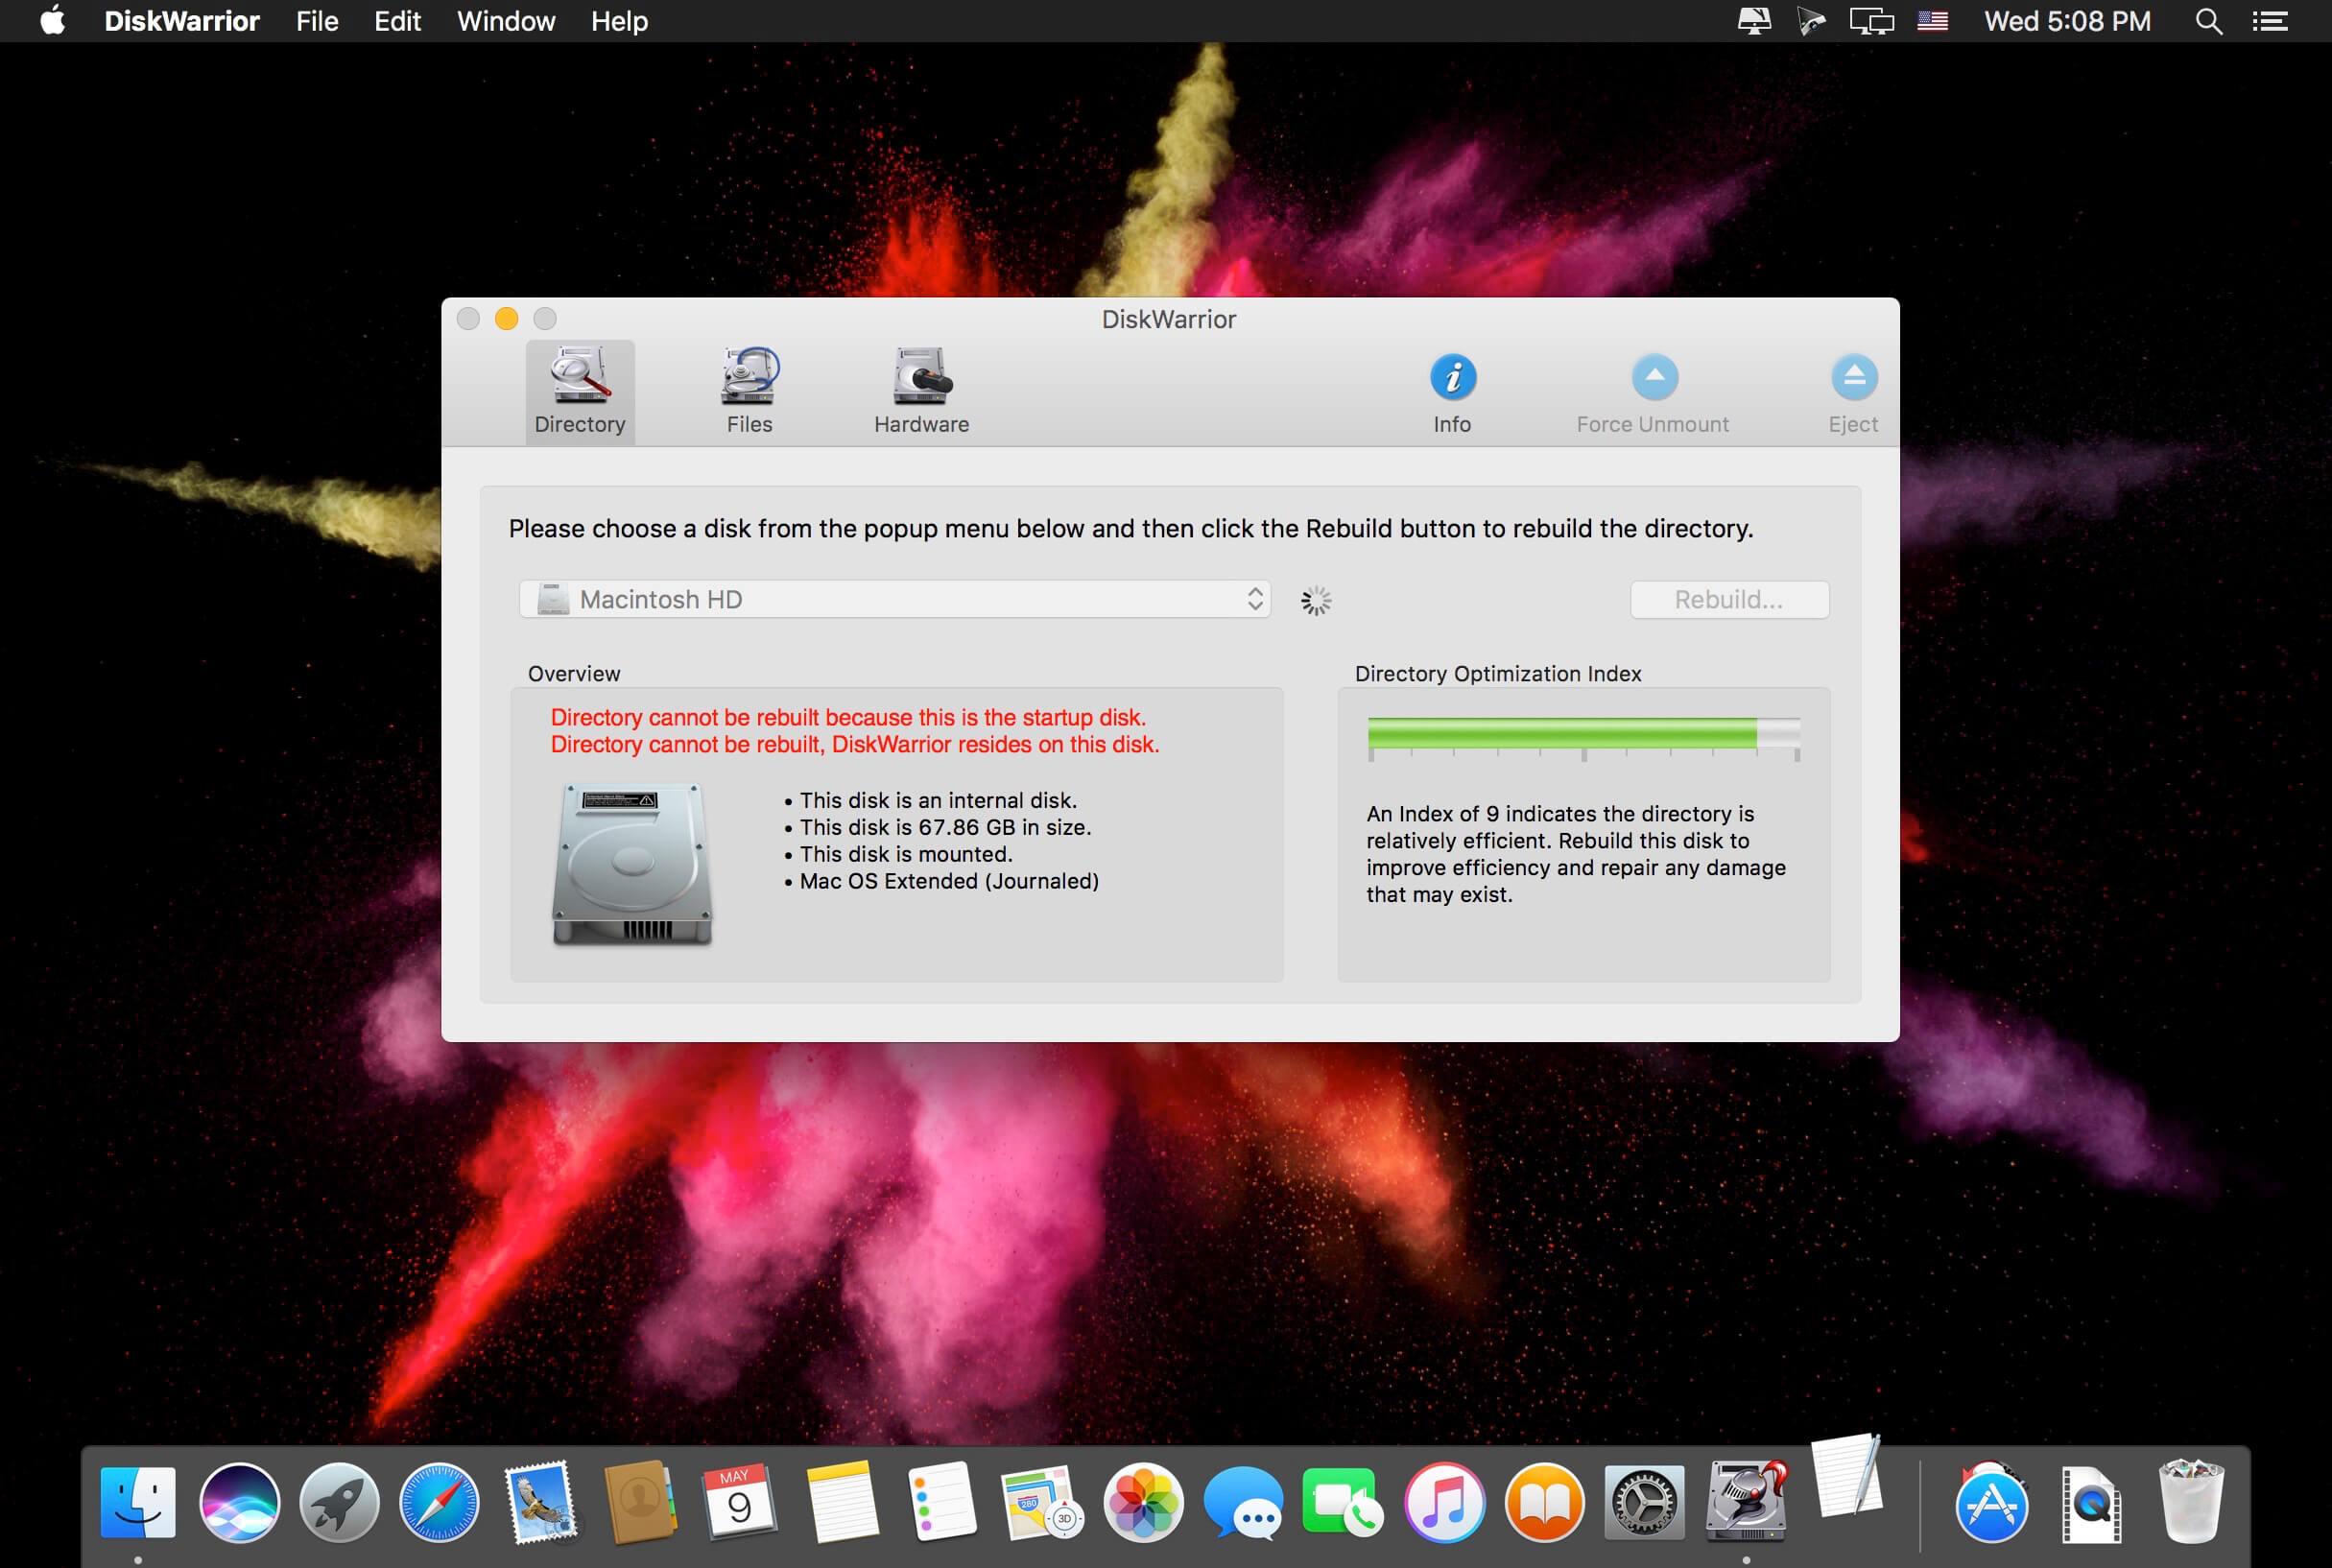 diskwarrior 5.2 download